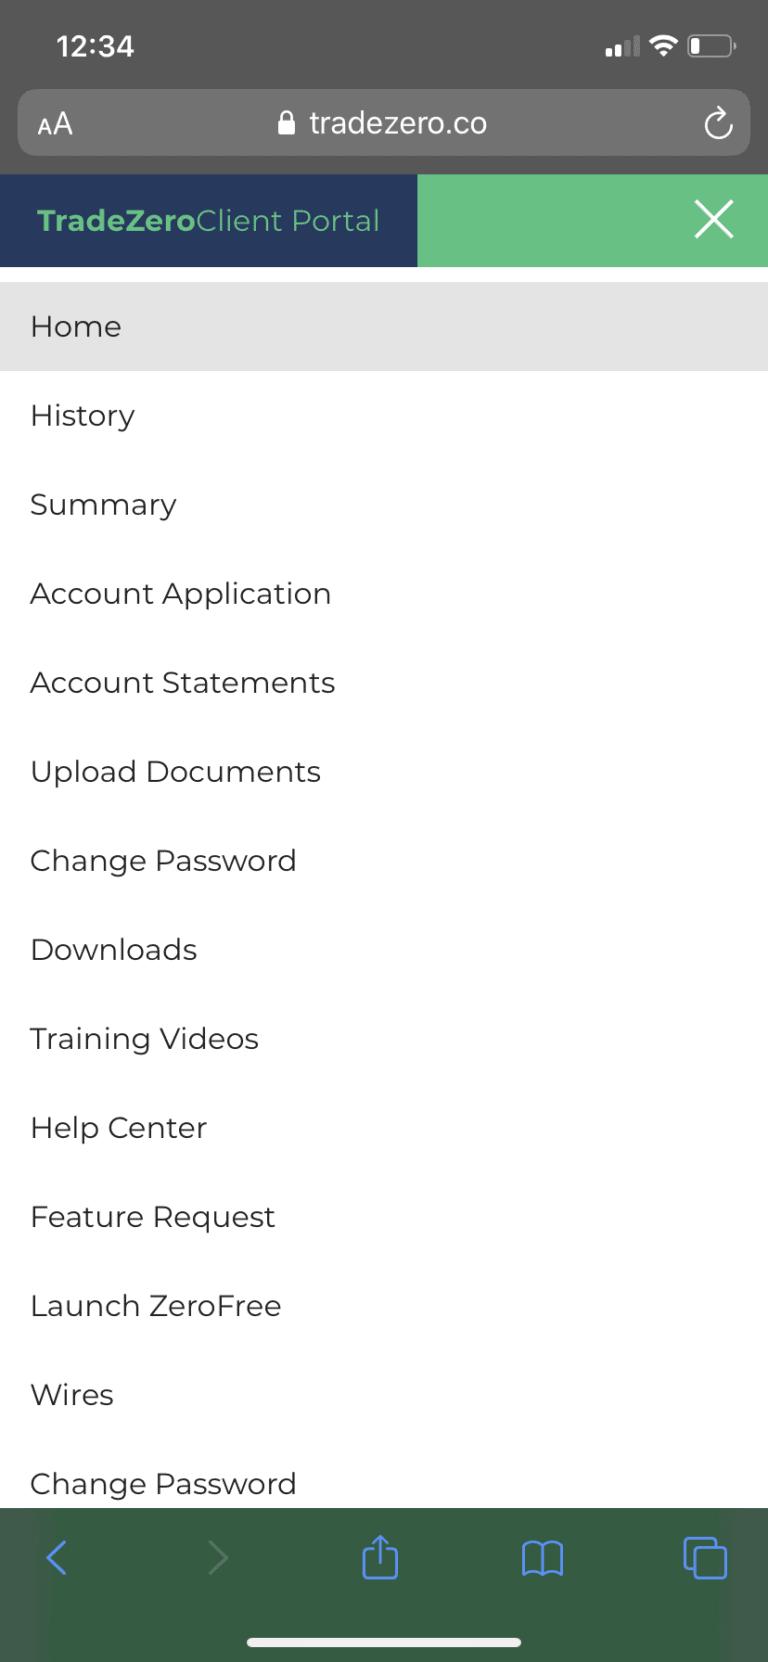 TradeZero Client Portal app